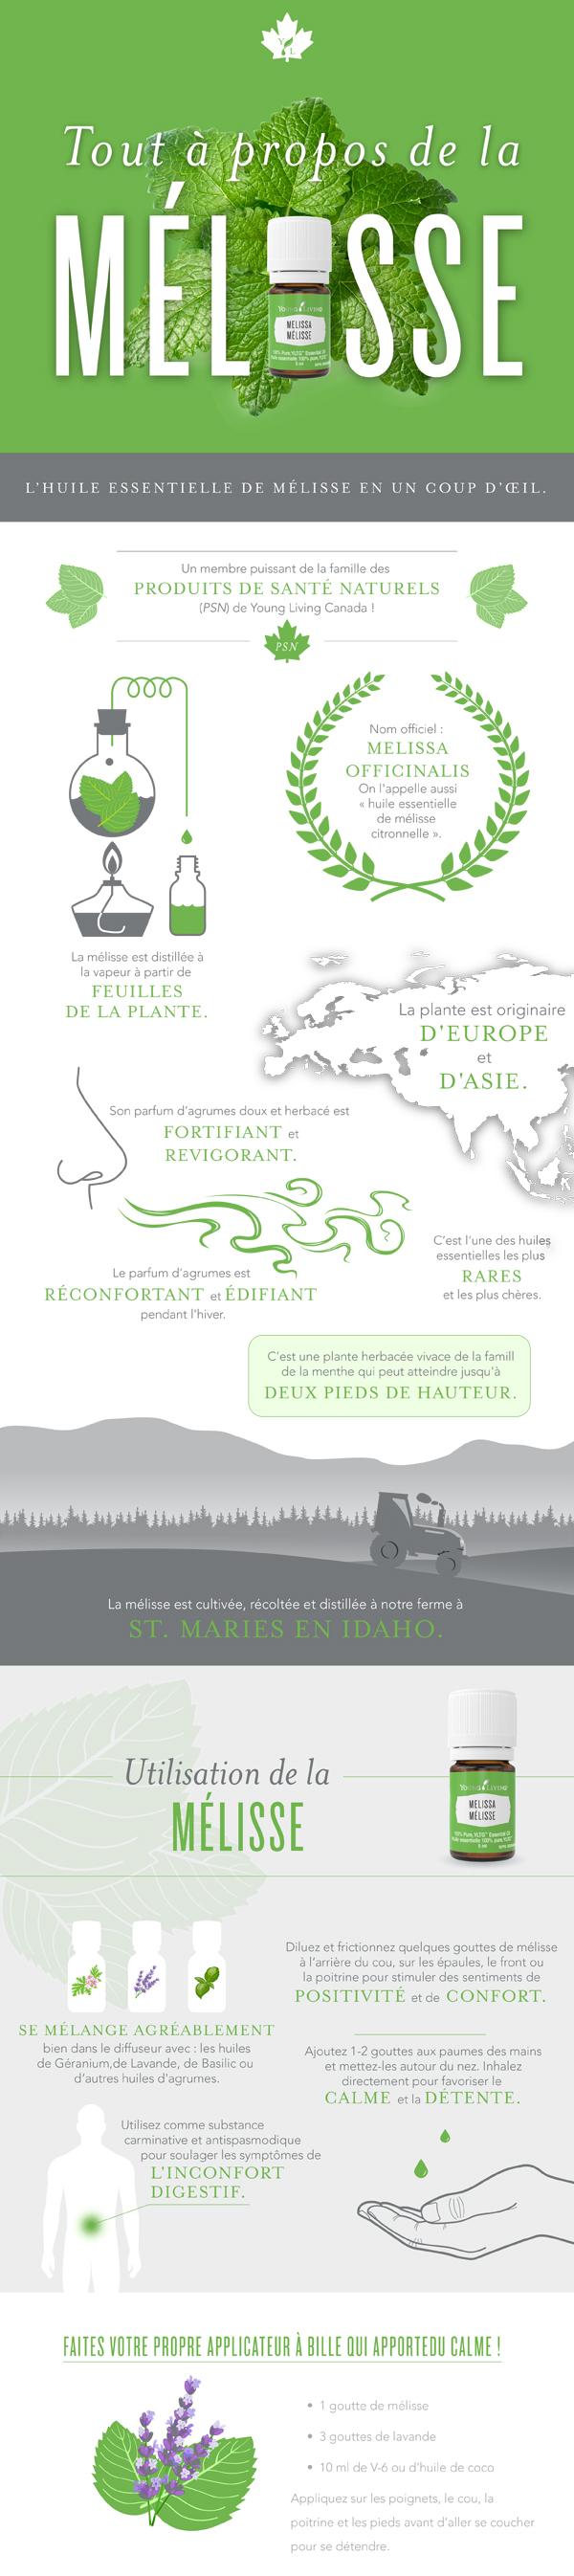 melissaenrollment_infographic_fr_ca_0317_bh_r2